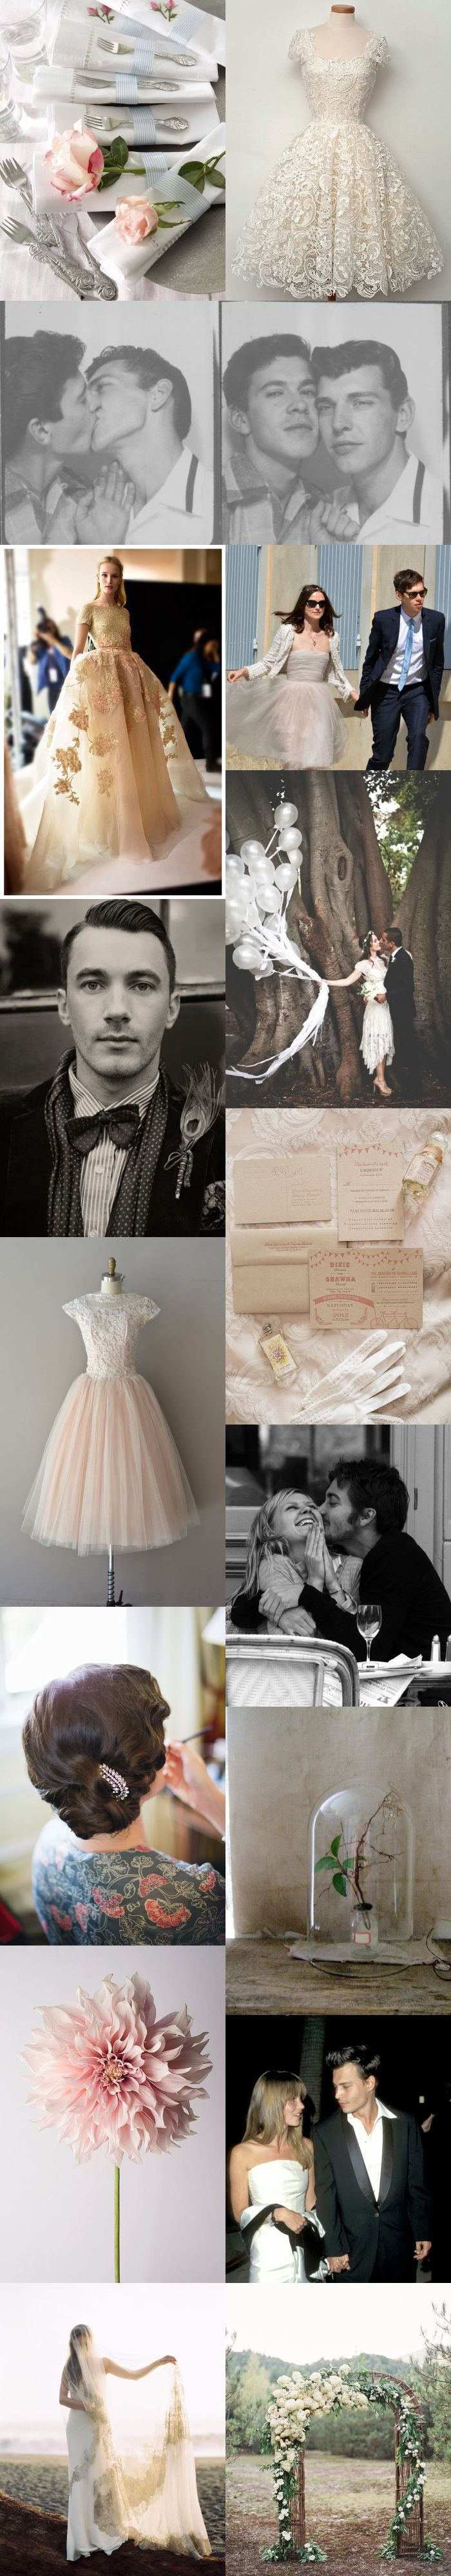 Vintage-bröllops-forum hos Elsa Billgren